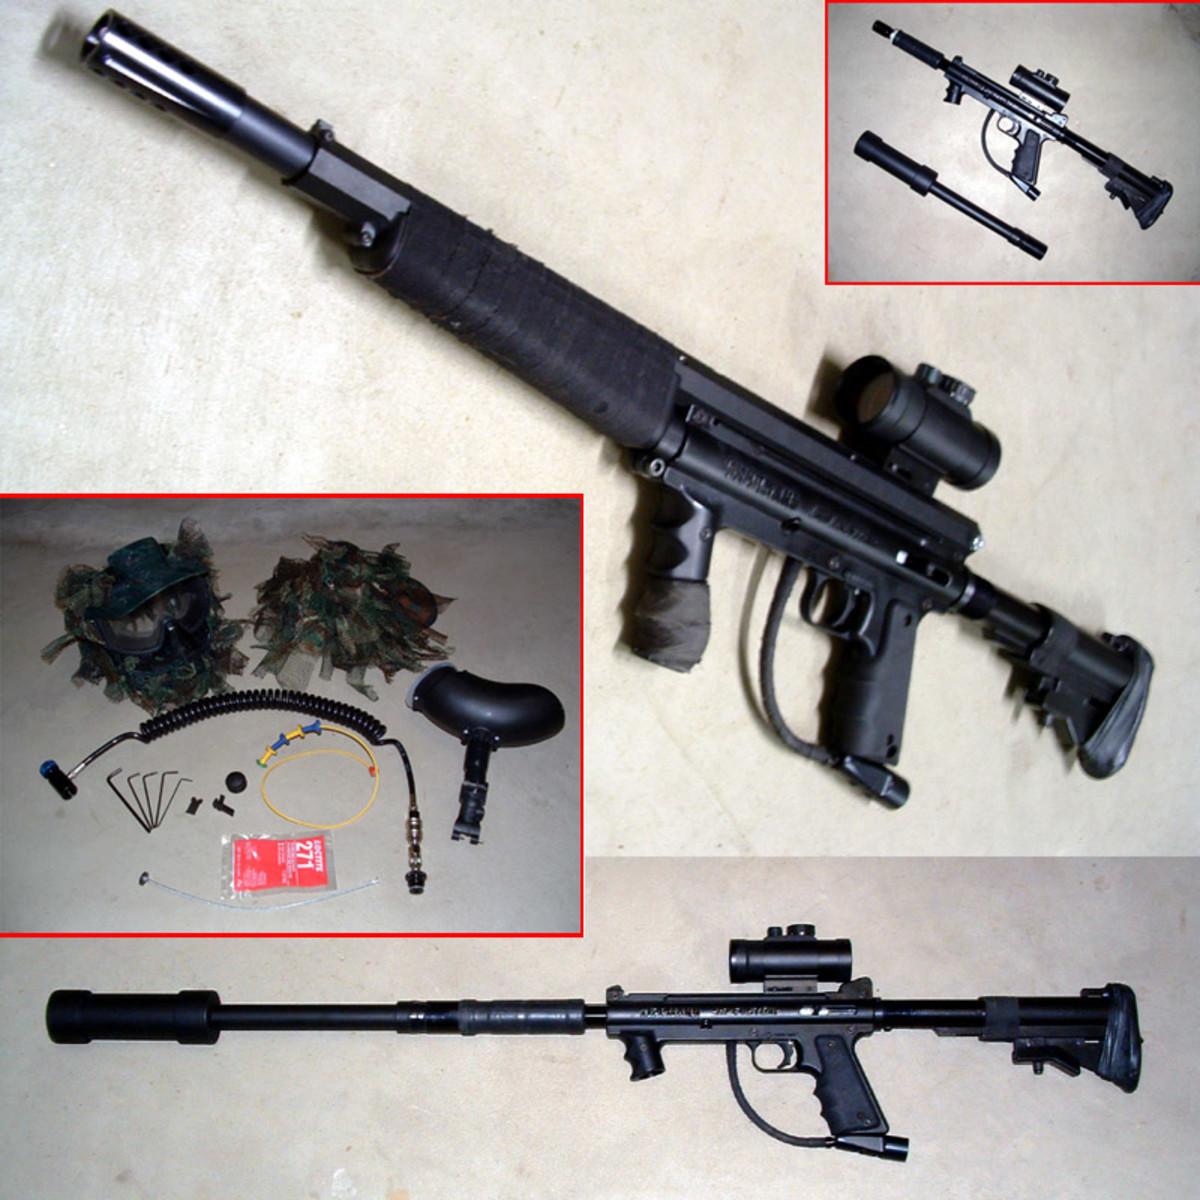 ... Tipmann Sniper Rifle is pretty sweet, makes the best paintball gun